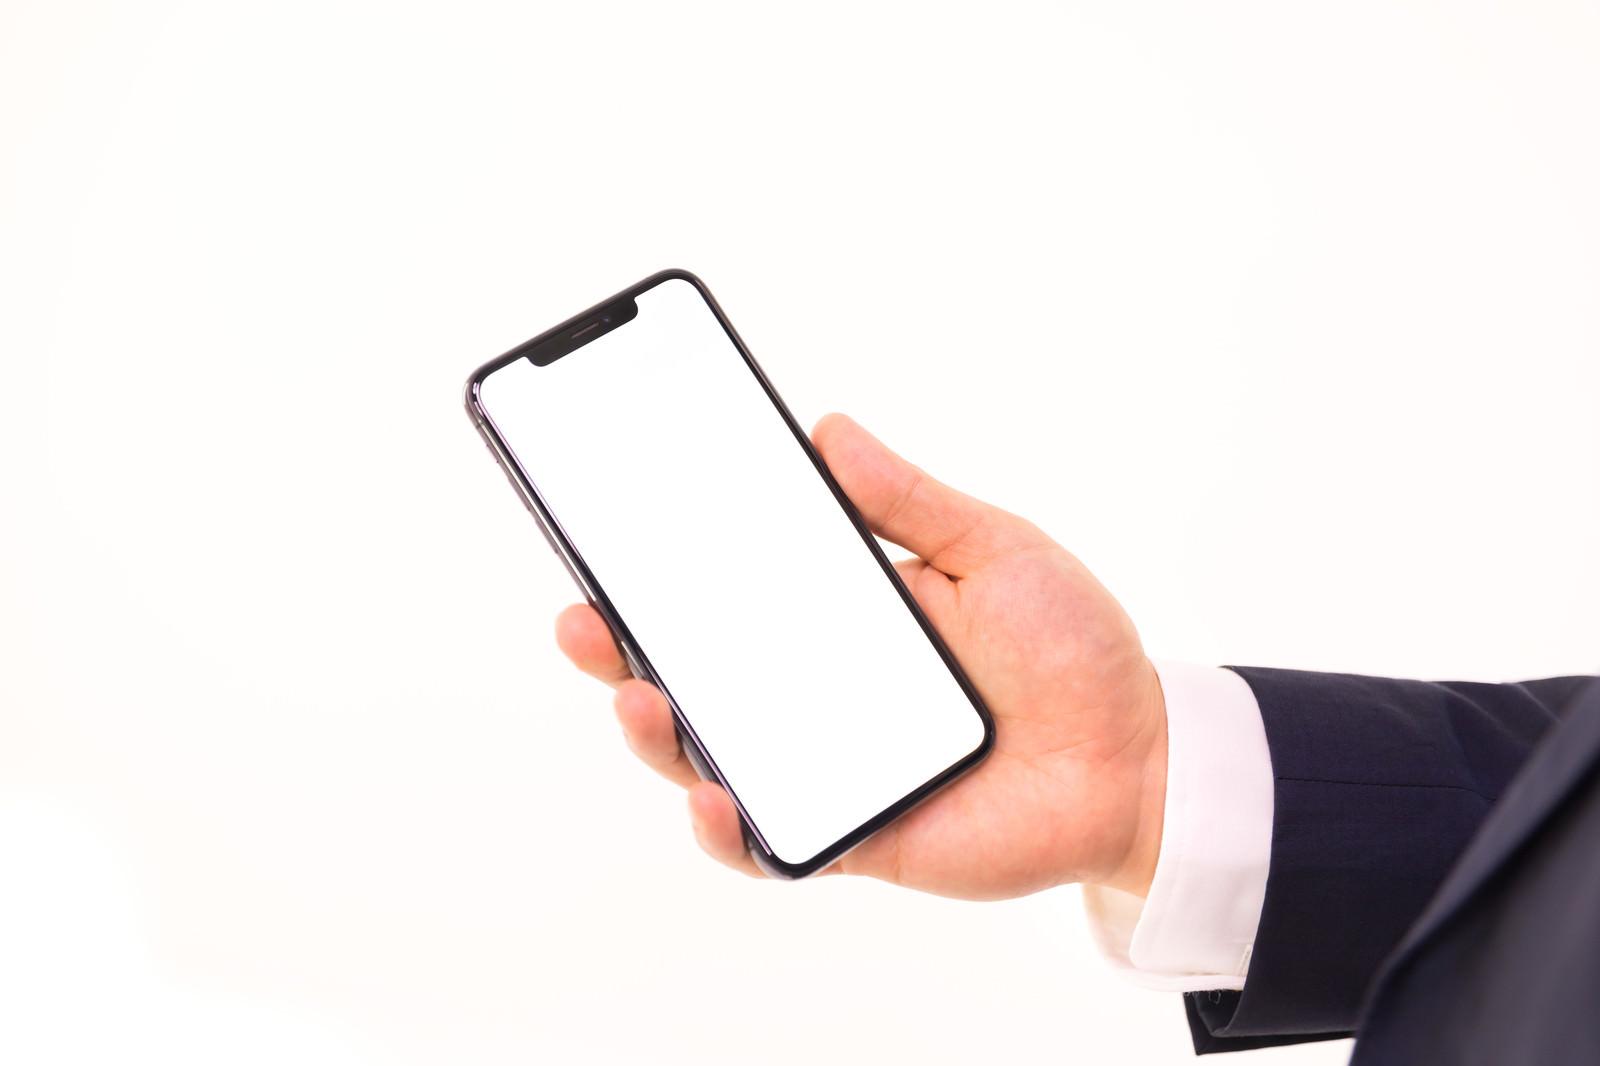 「iPhone XS Max を持つ手」の写真[モデル:Max_Ezaki]